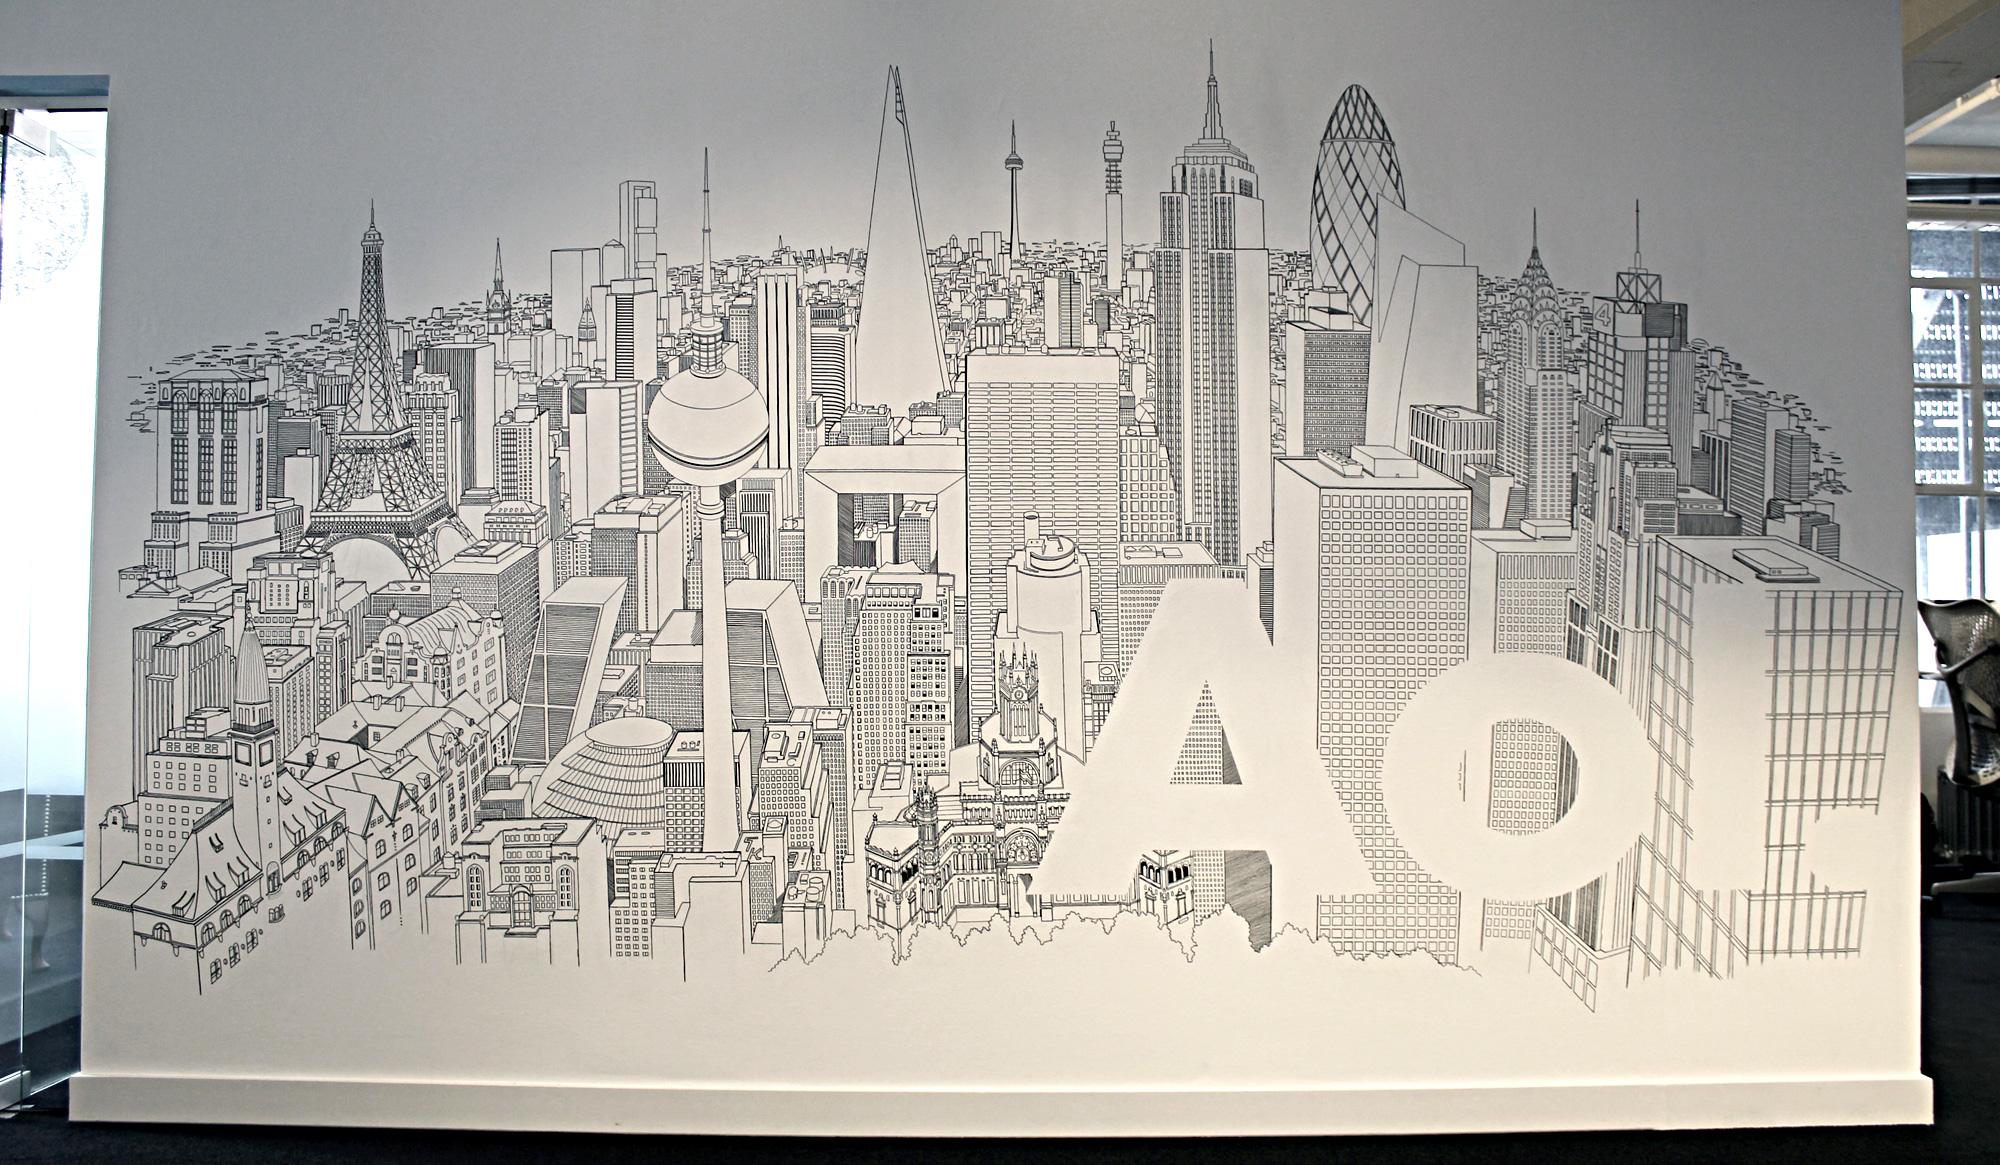 AOL mural